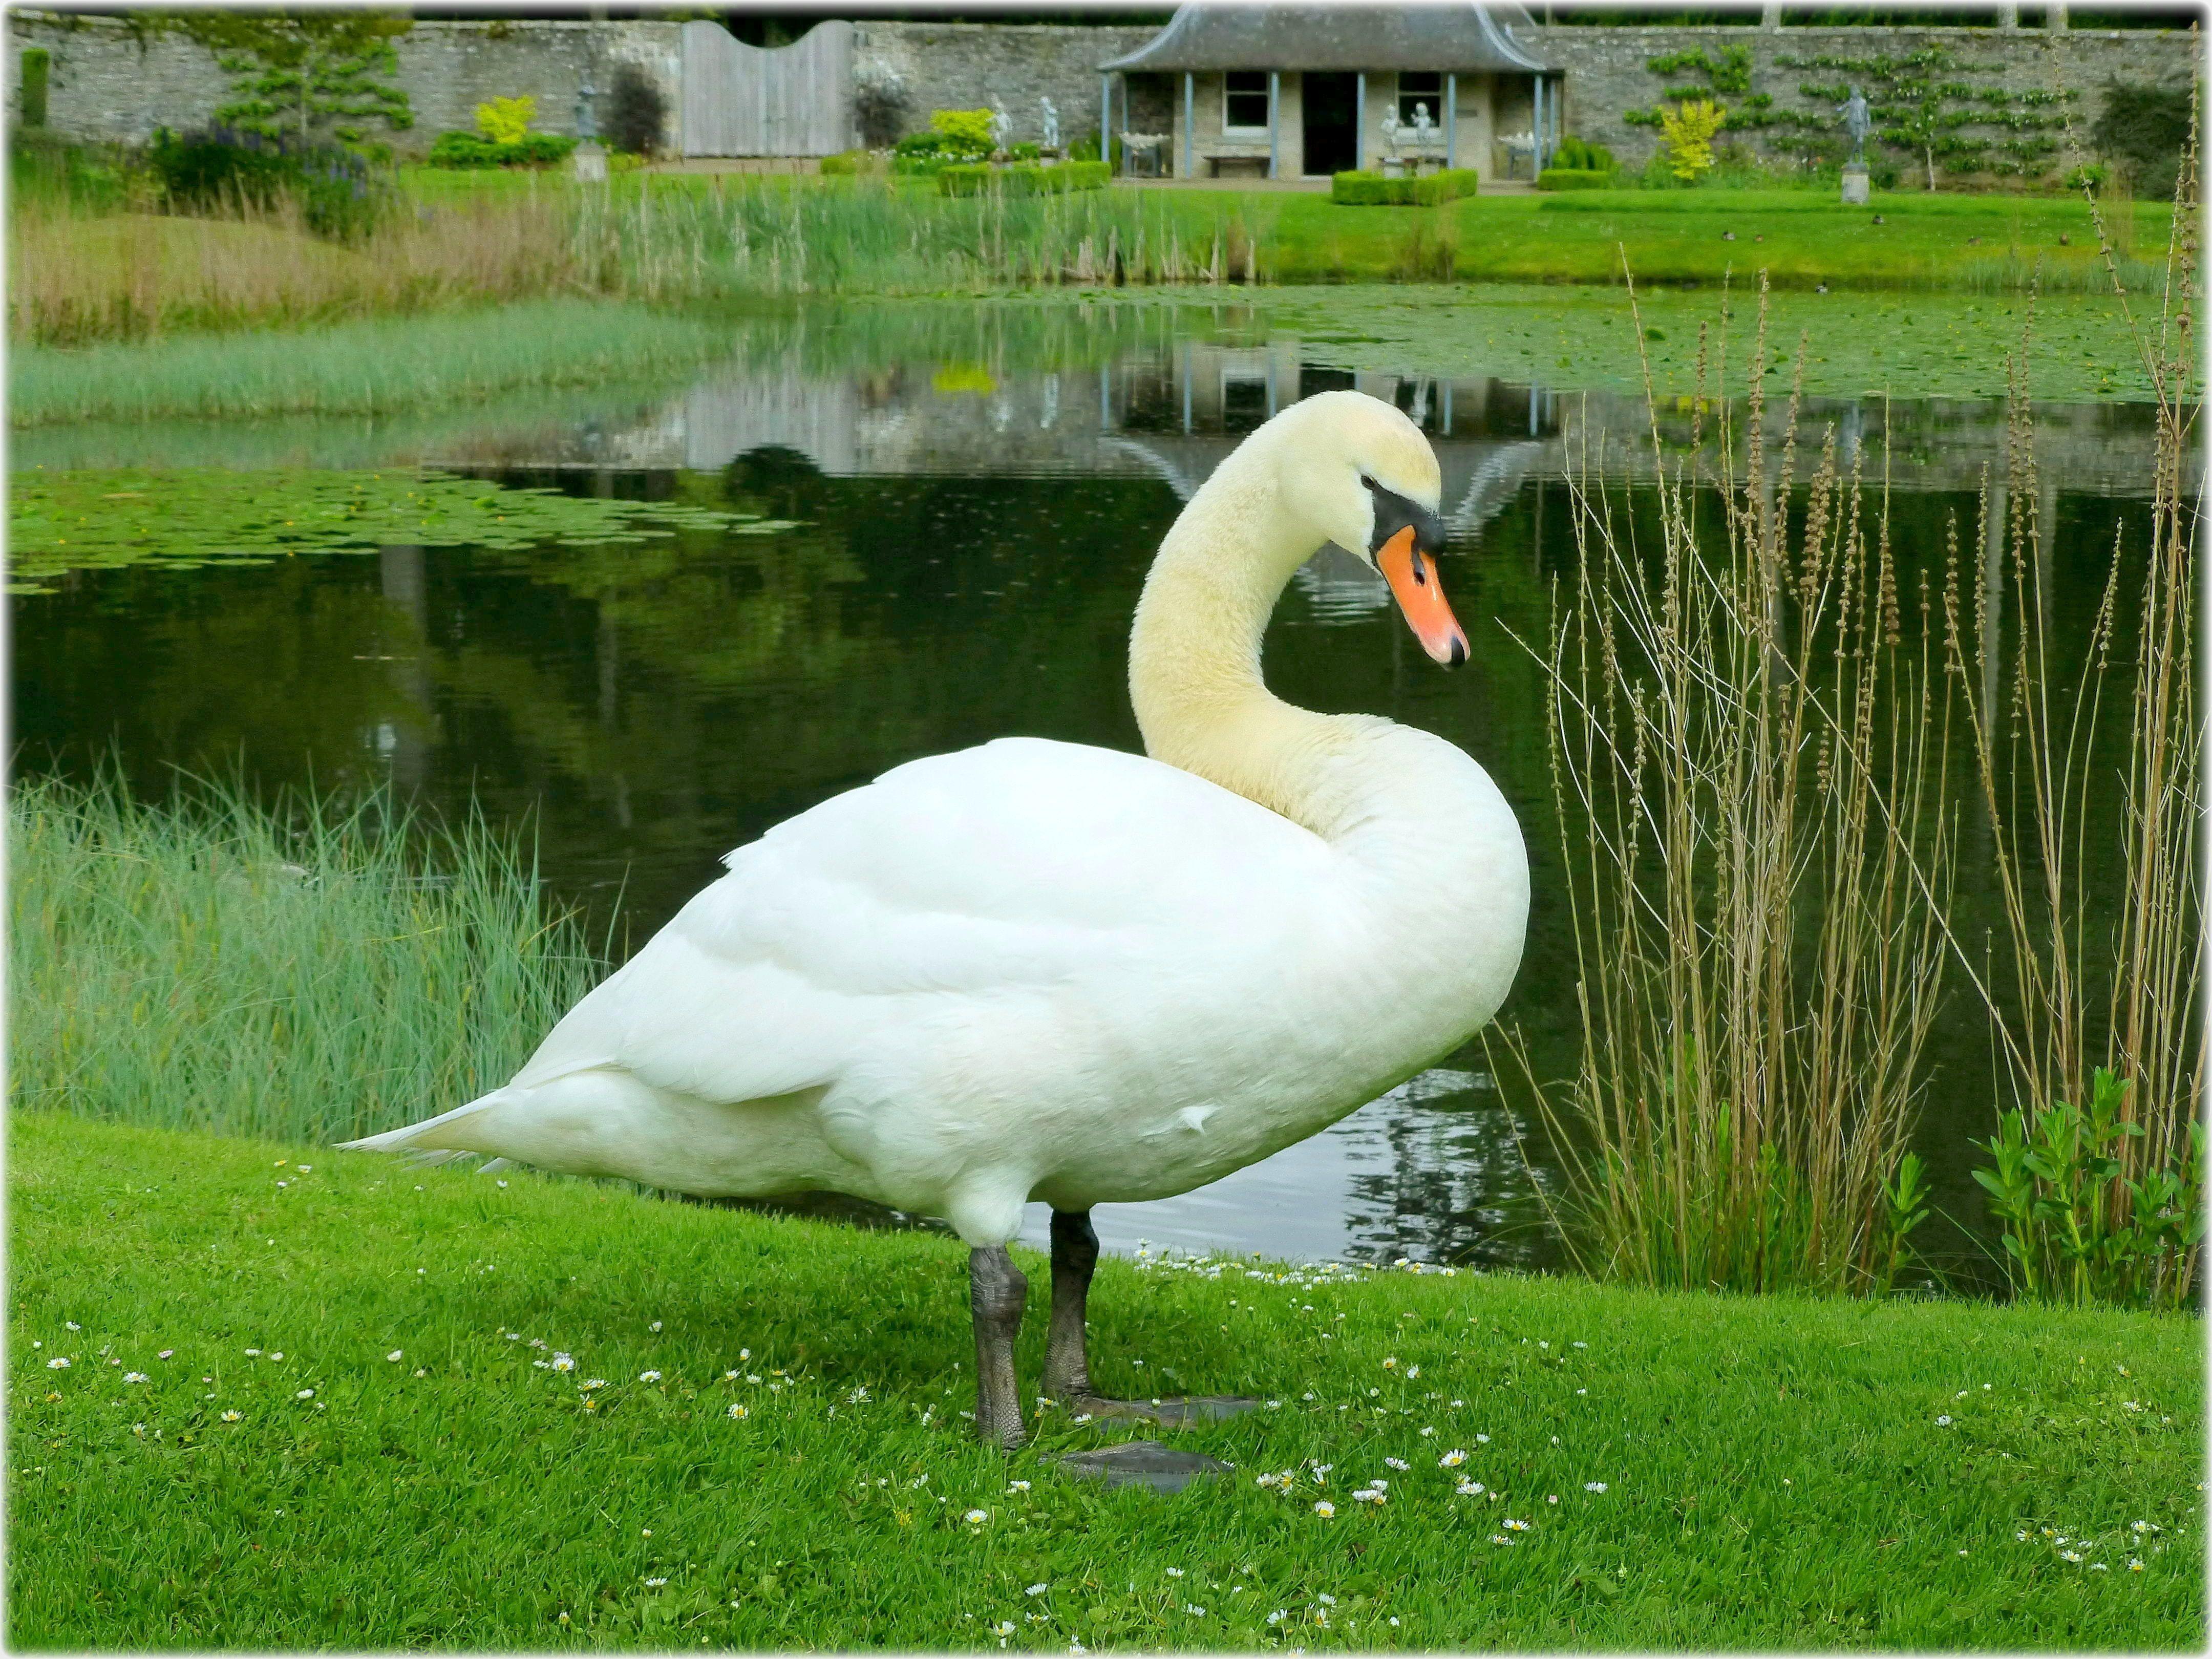 Mute Swan at the Hercules Garden, Blair Castle. by Tom MacDonald, May 2014.